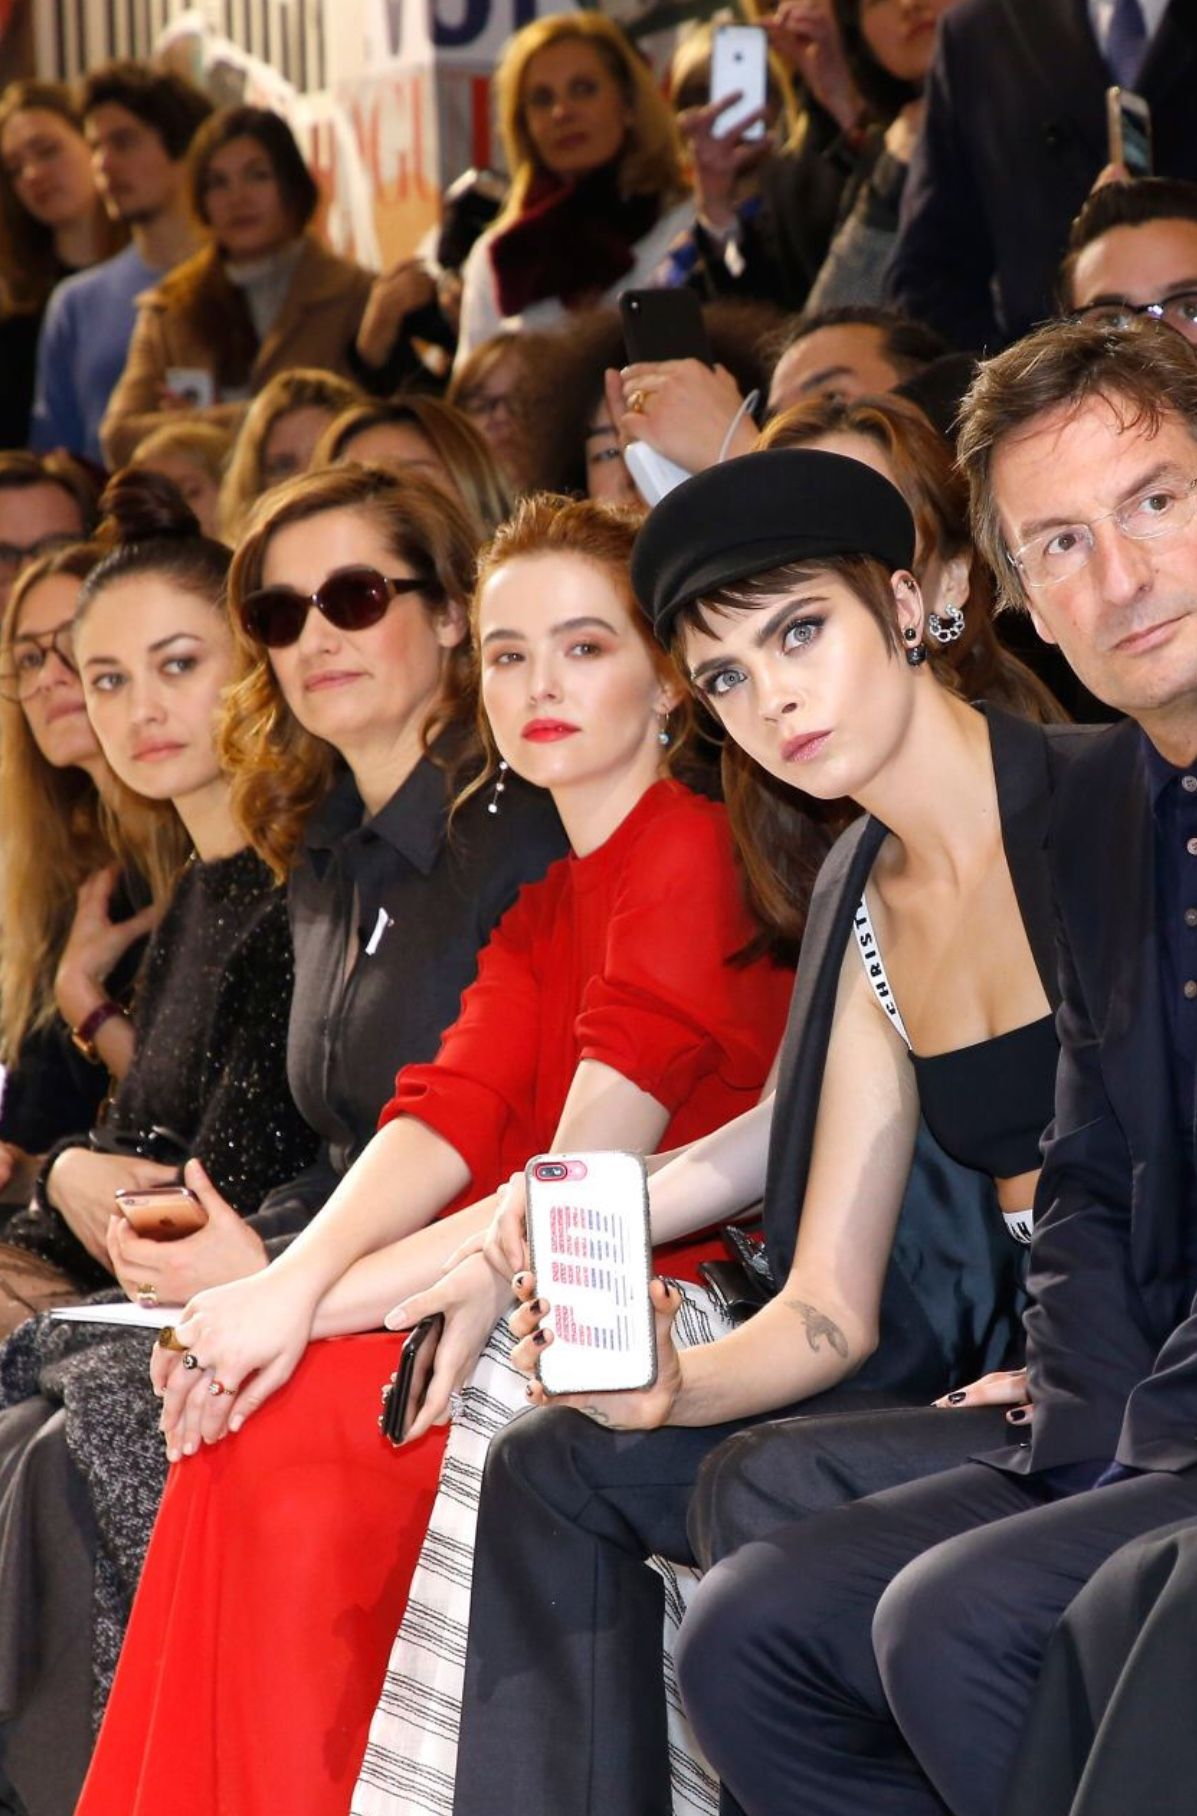 Paris Fashion Week Womenswear Fall Winter 2018 2019 Dior February 27 033 Photogallery At Zoey Deutch Network Cara Delevingne 2018 Cara Delevingne Cara